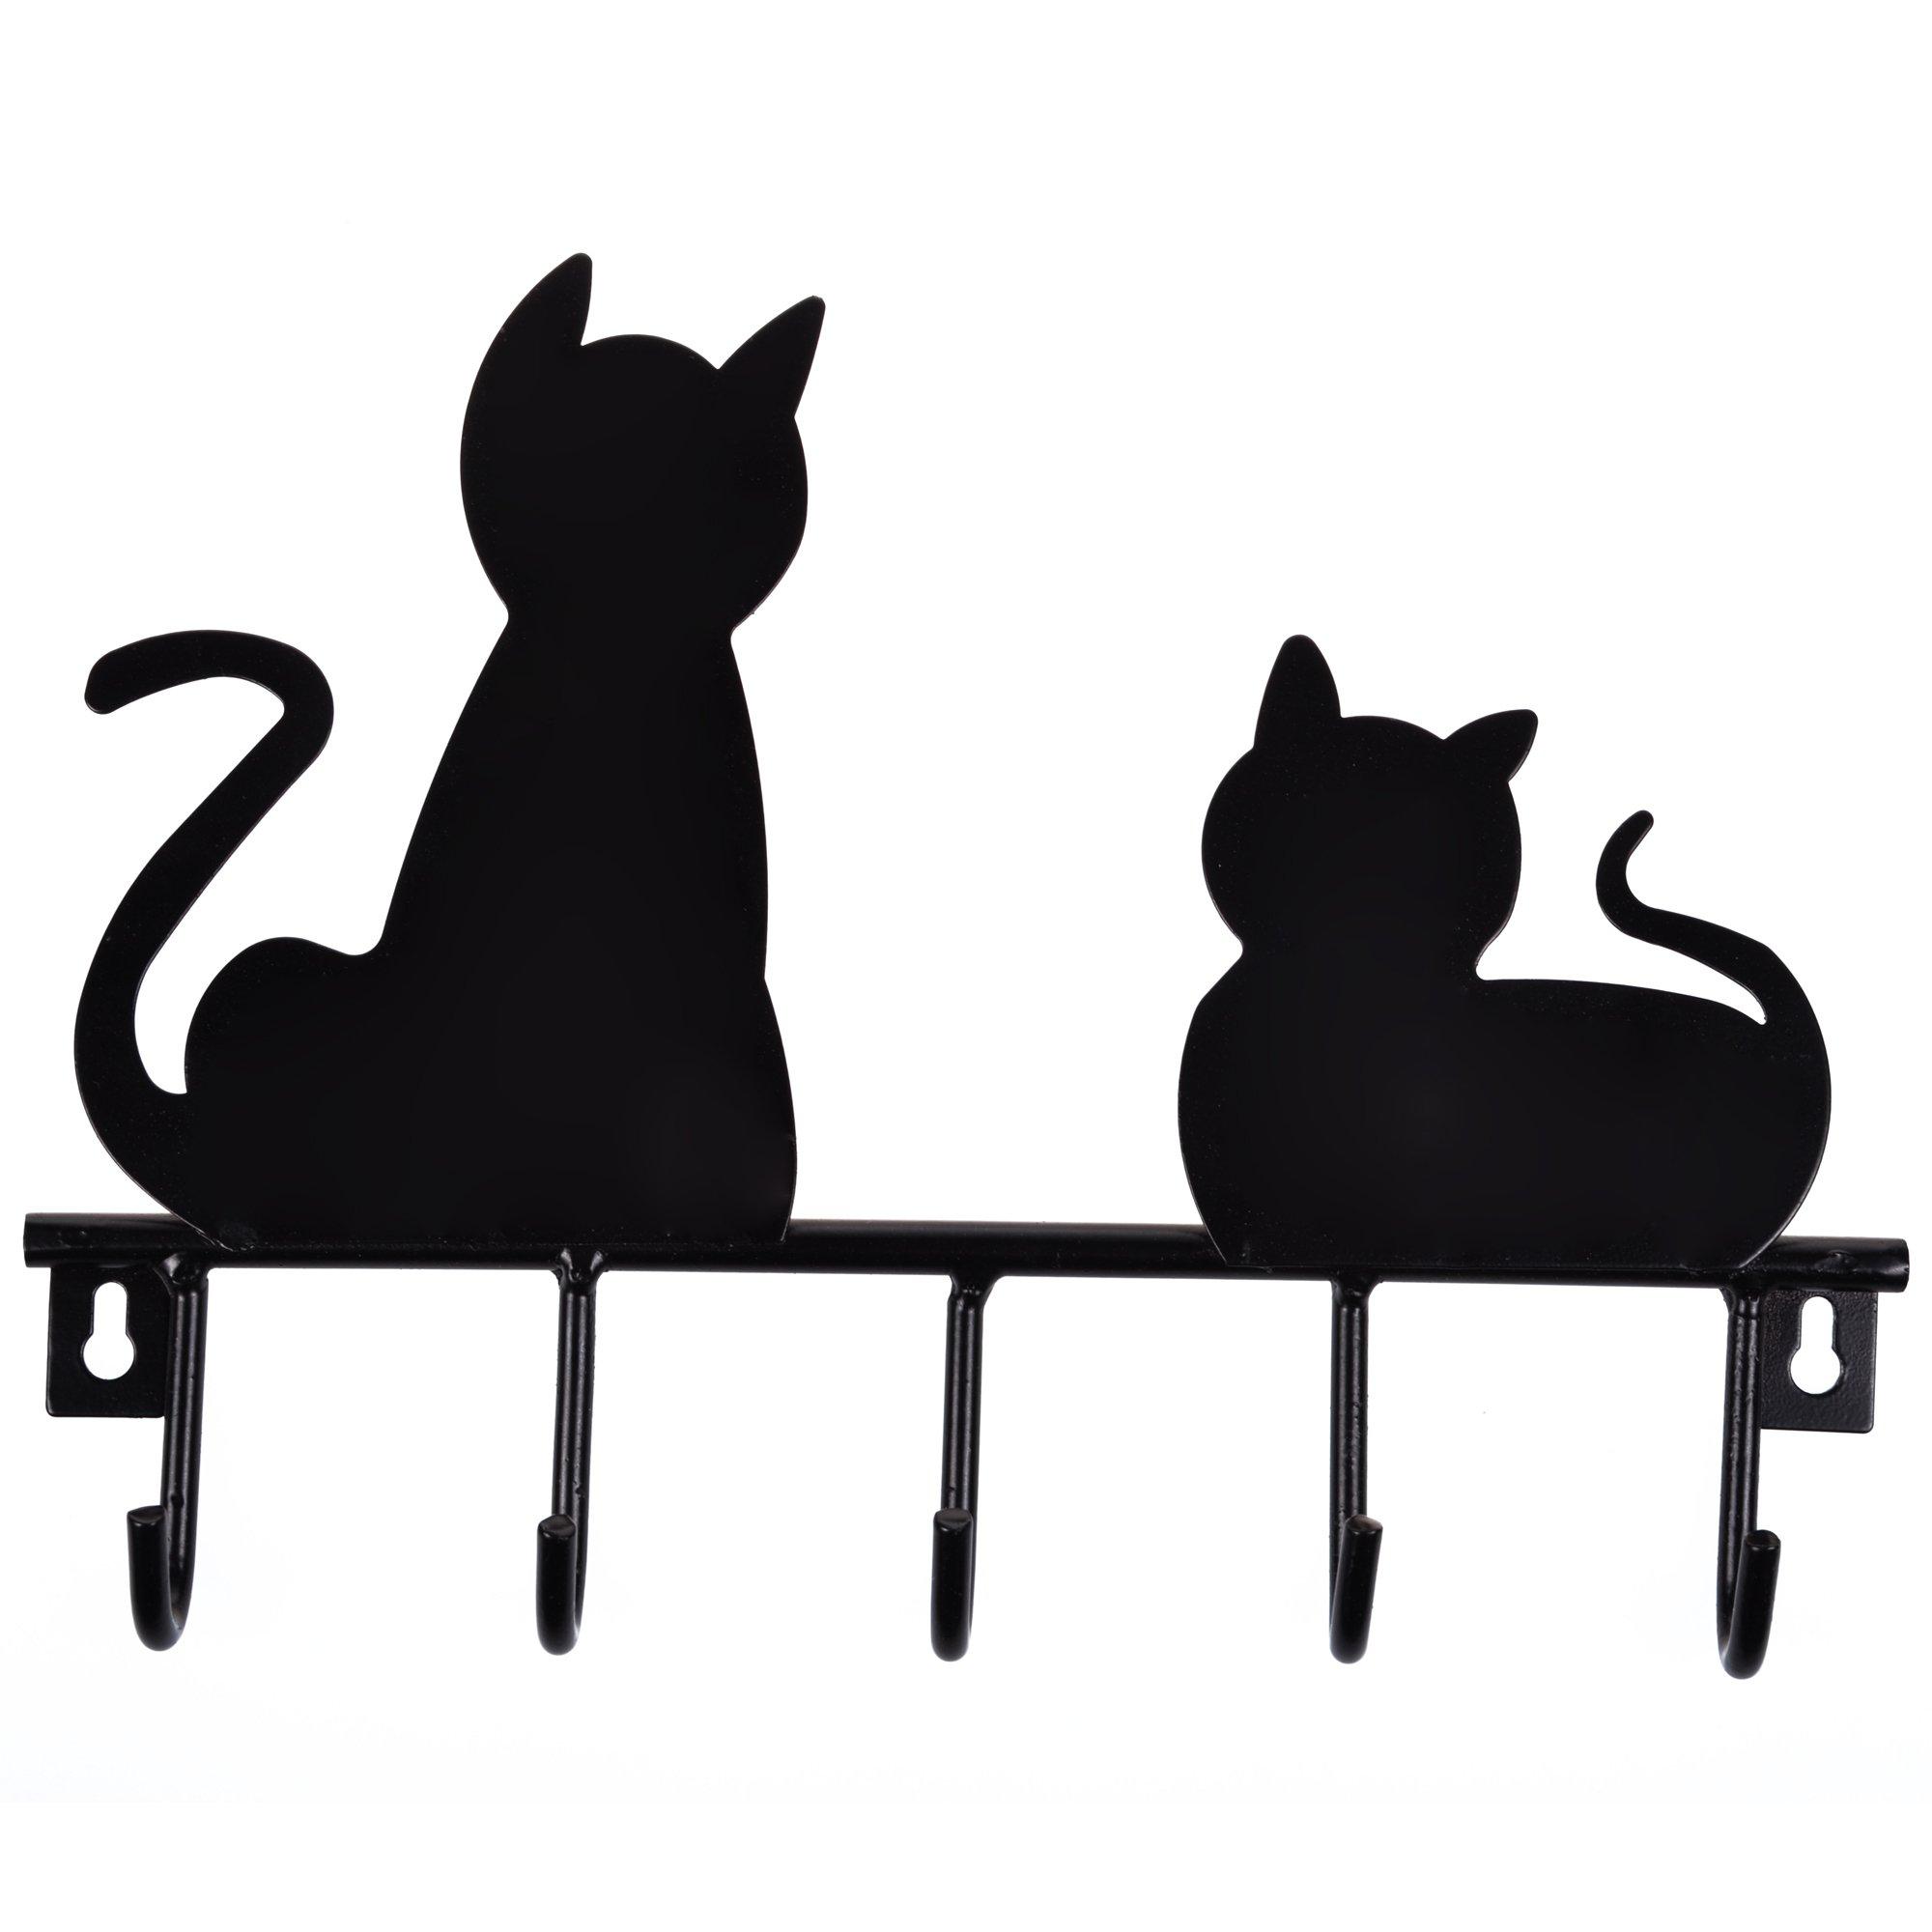 Bluecell Black Cats Solid Metal Wall Mounted 5-hooks Storage Rack / Key Hook/ Holder